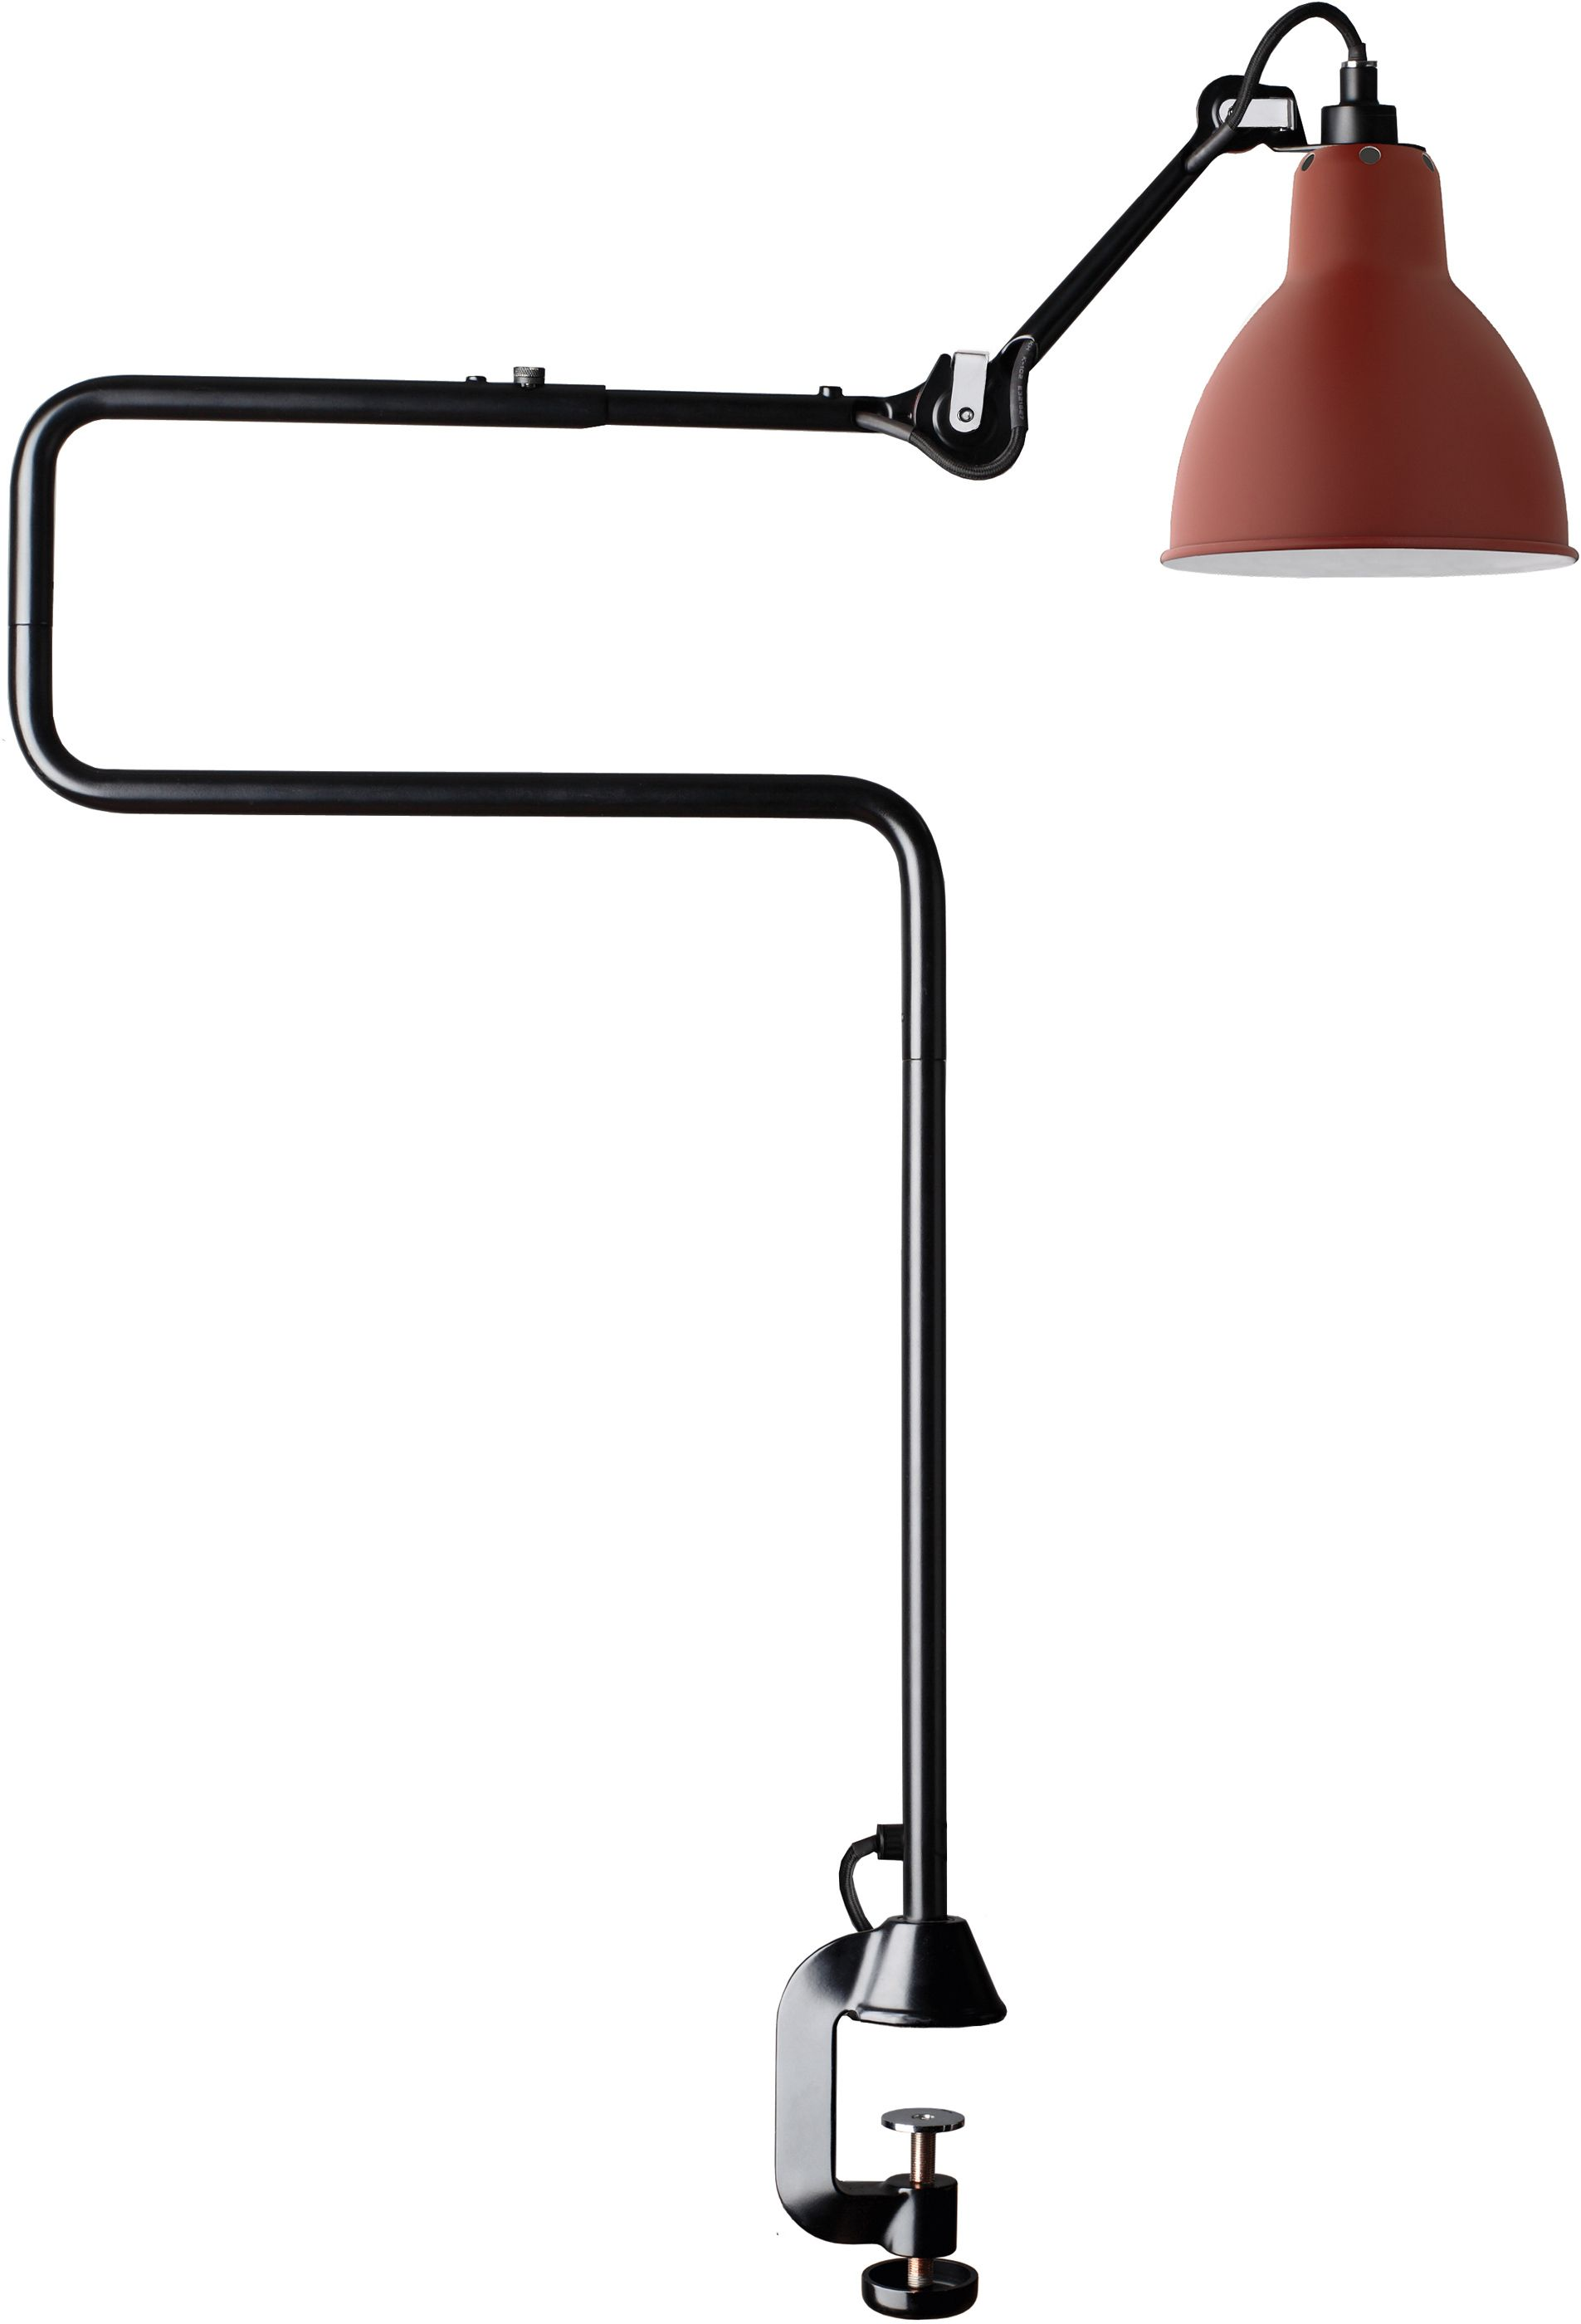 DCW éditions Lampe Gras N211 bureaulamp met tafelklem Rood